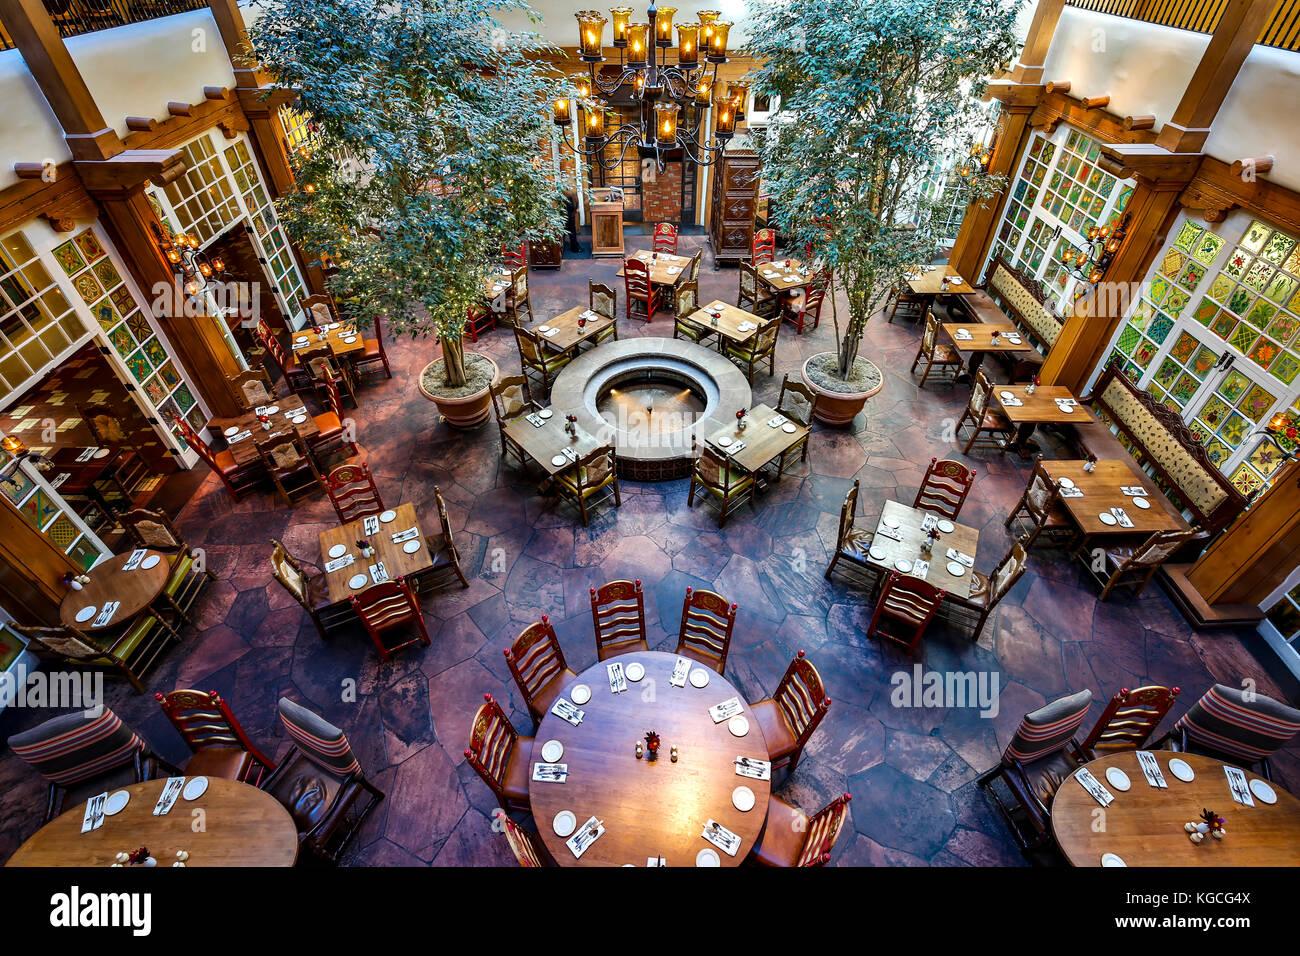 La Fonda Restaurant Santa Fe New Mexico